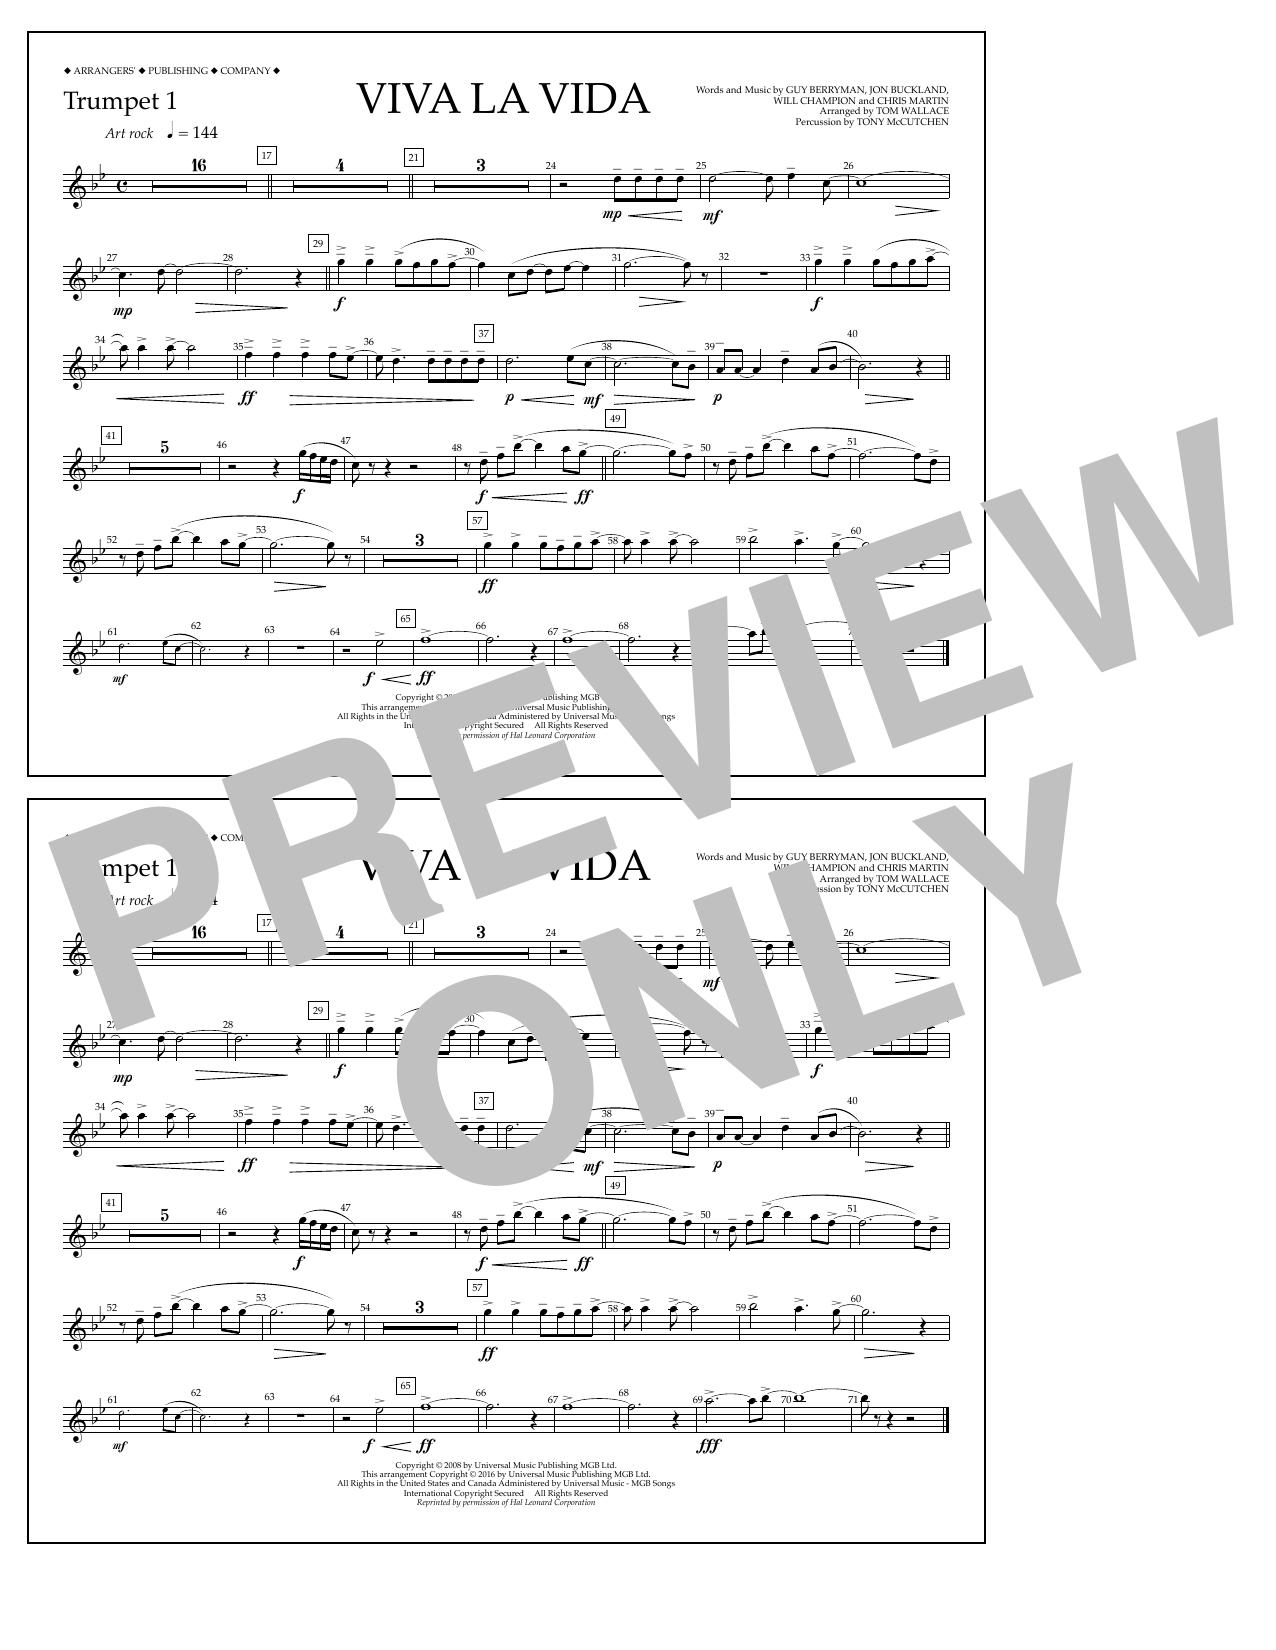 Coldplay - Viva La Vida - Trumpet 1